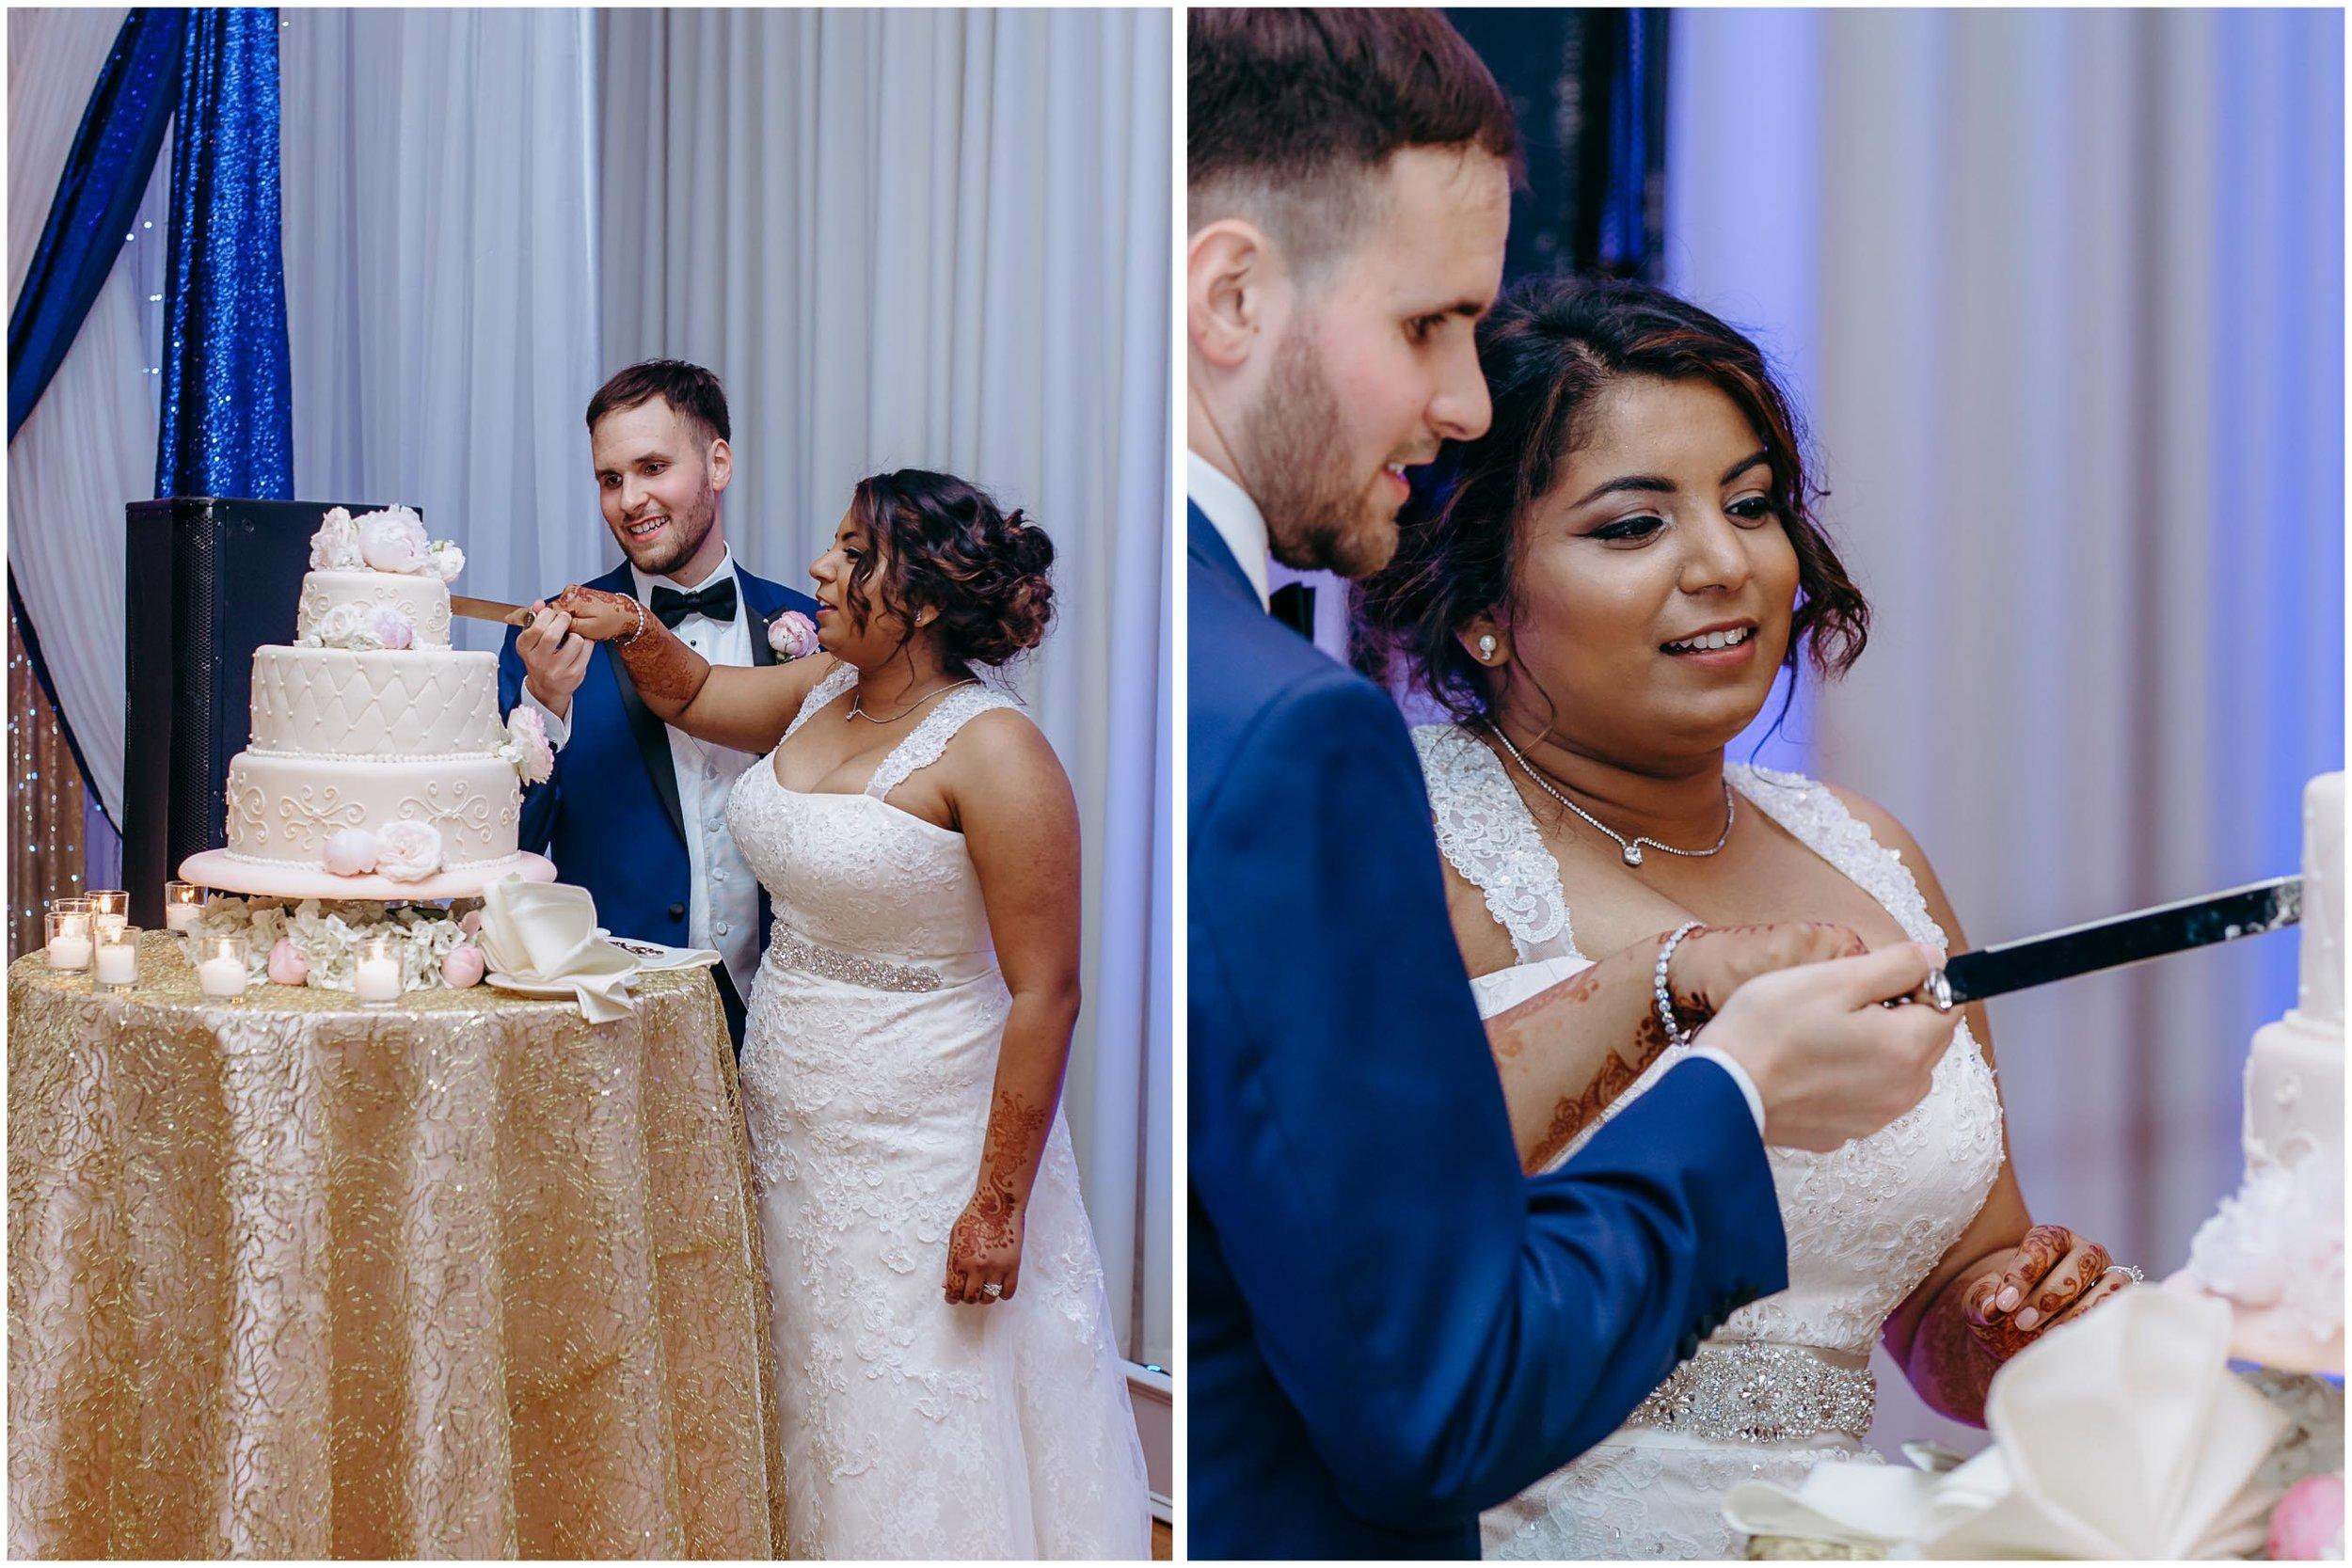 NH wedding photography, NH wedding photographer, wedding photographer NH, wedding photographers NH, wedding photography NH, wedding cake